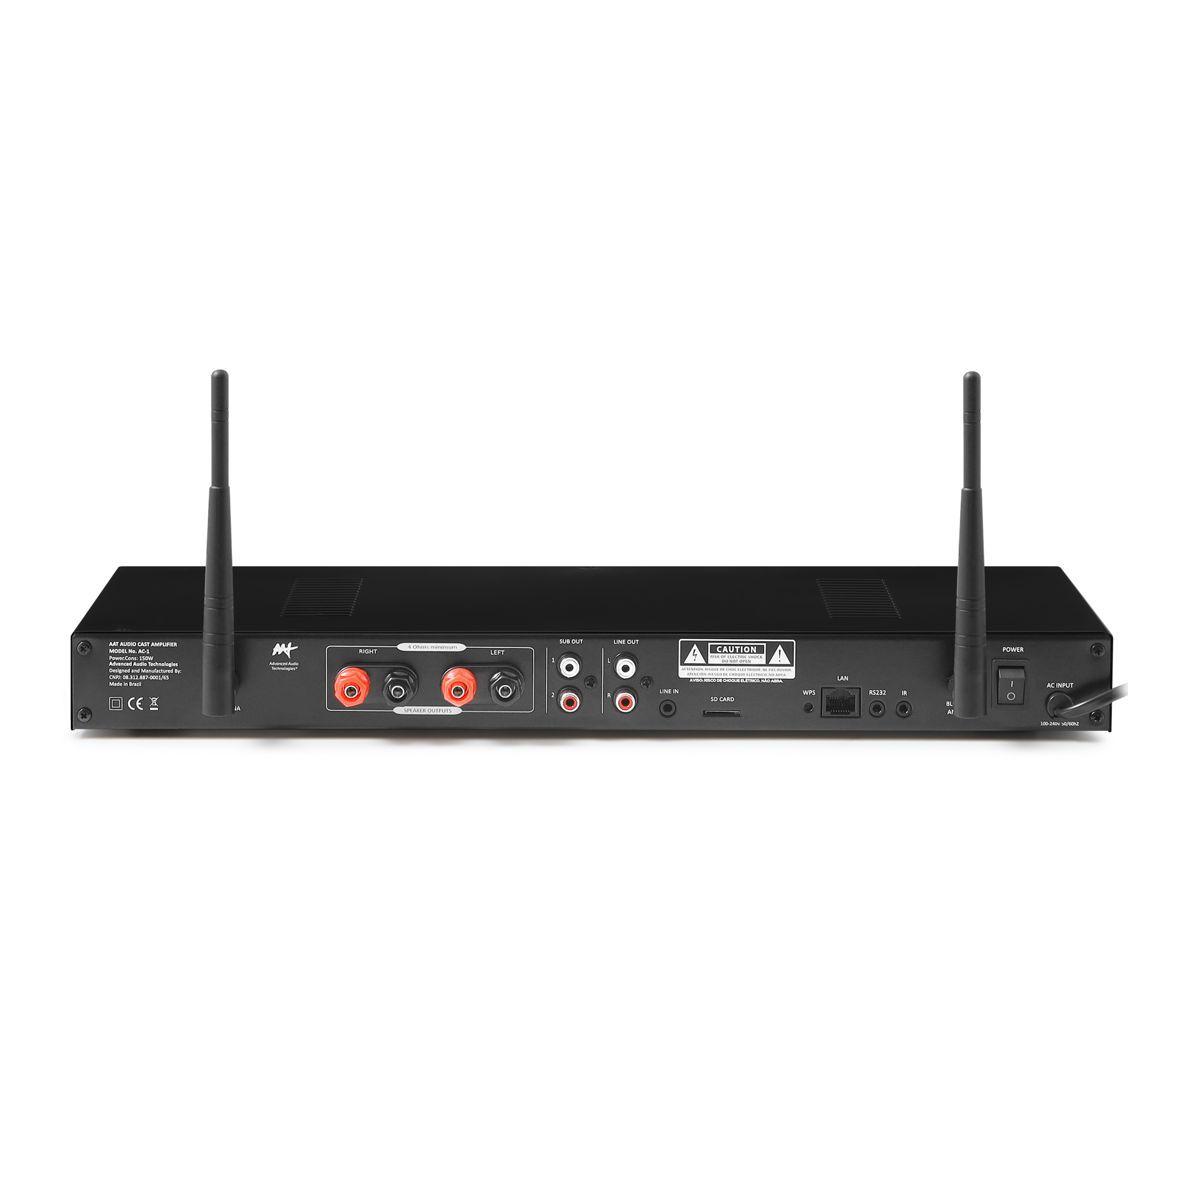 Kit Som Ambiente Amplificador Multimídia Wi-Fi 1 Zona AC-1 AAT + 4 Caixa de Embutir LR-E100 AAT